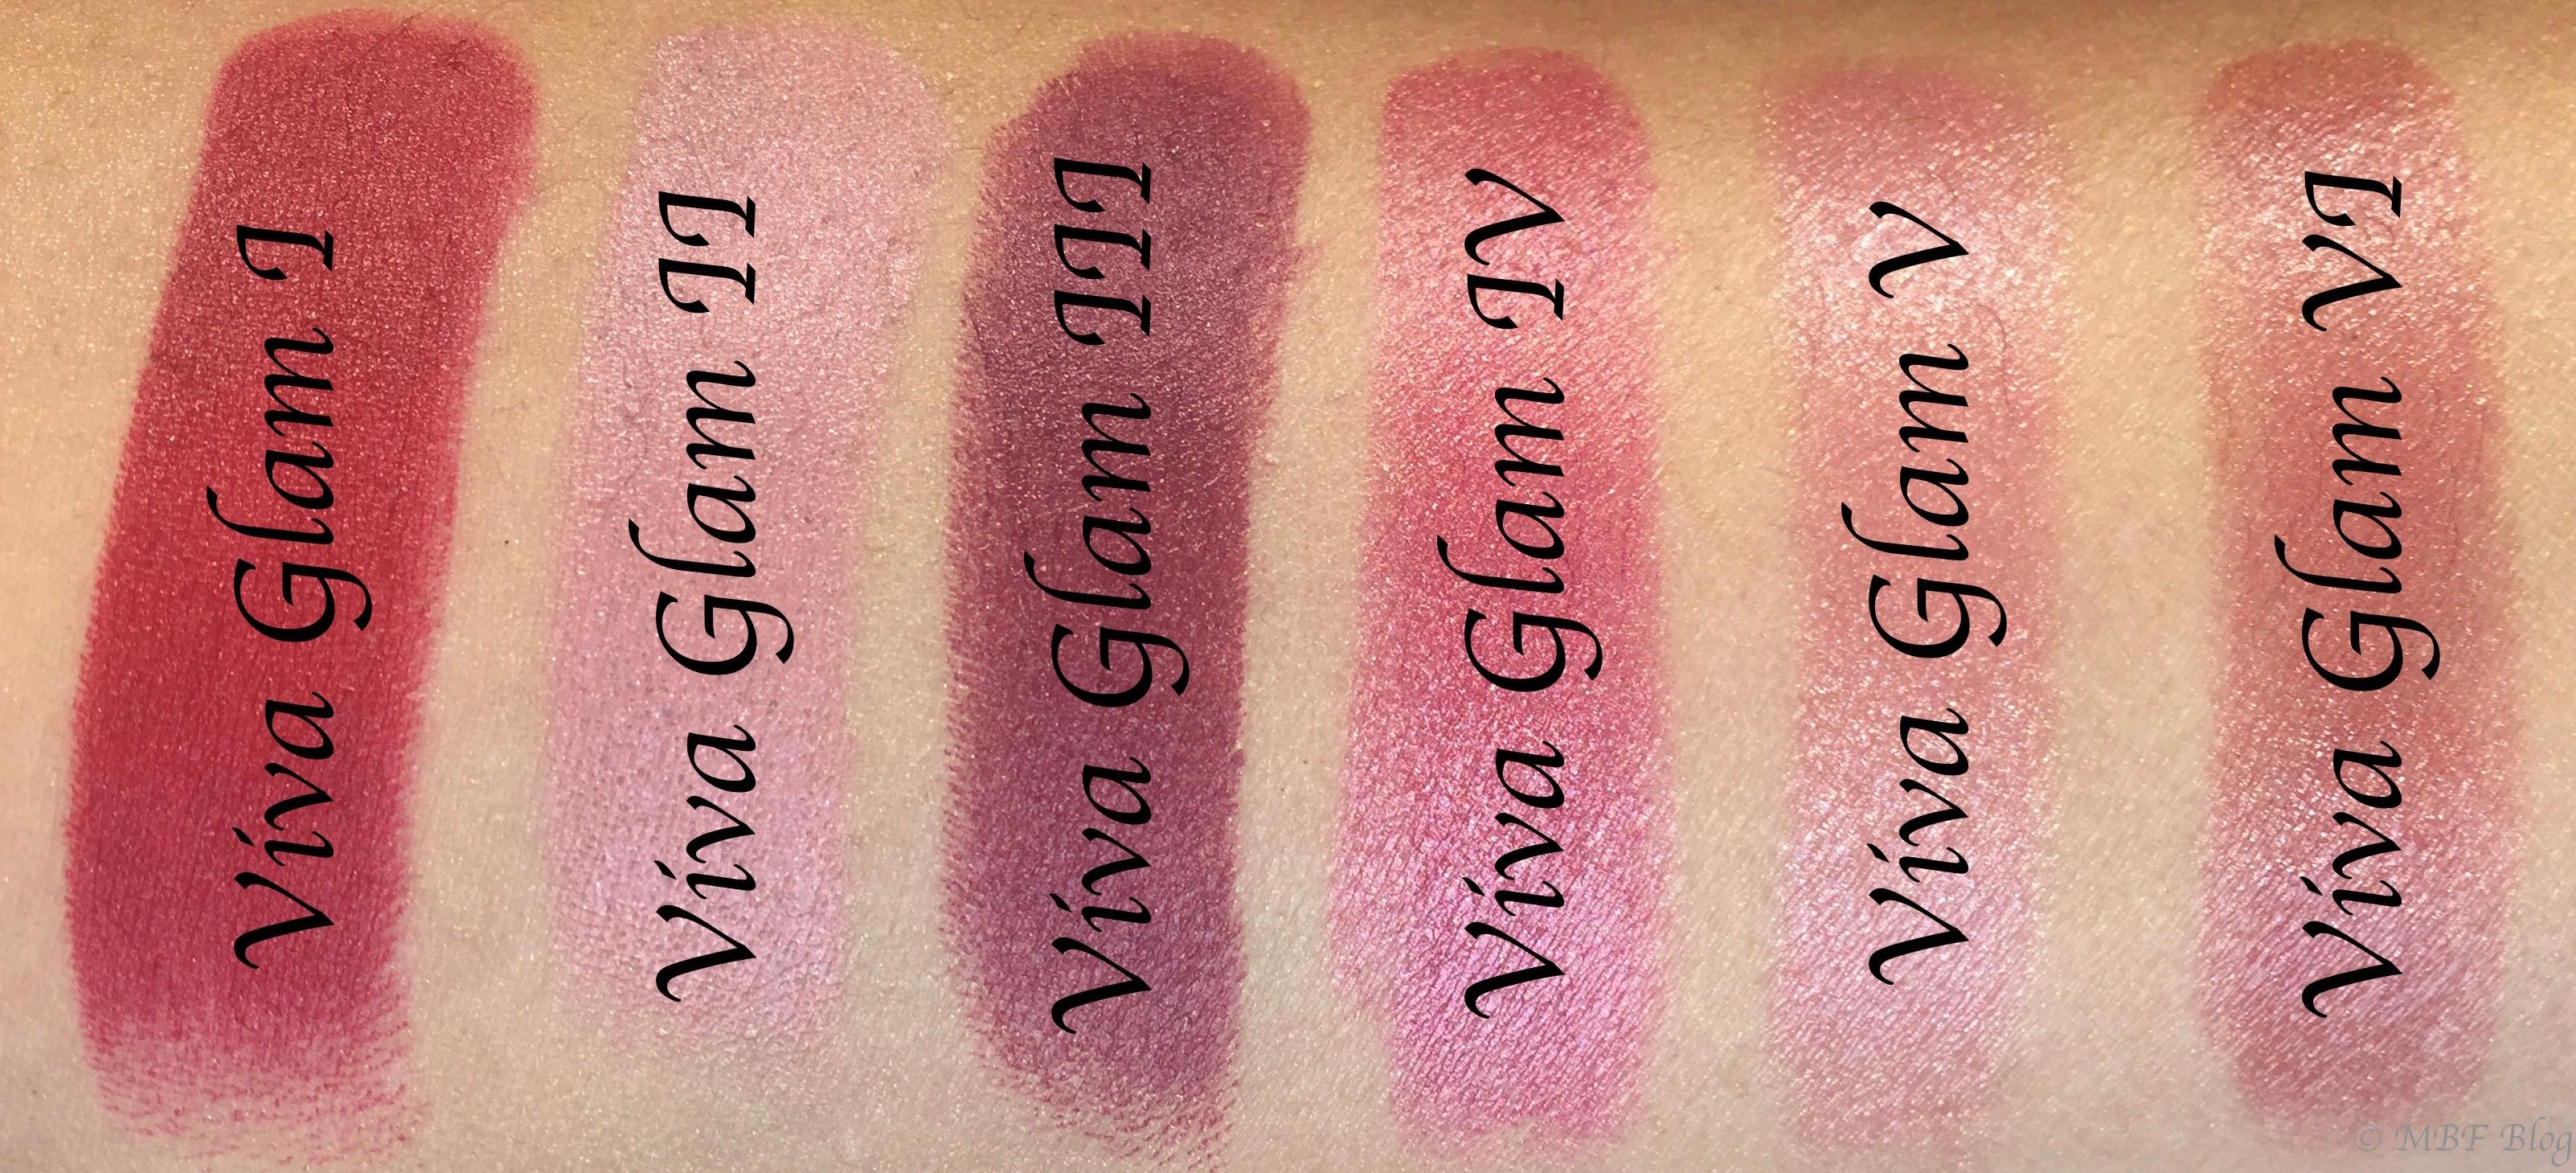 All MAC Viva Glam Lipsticks Shades Review, Swatches Viva ...